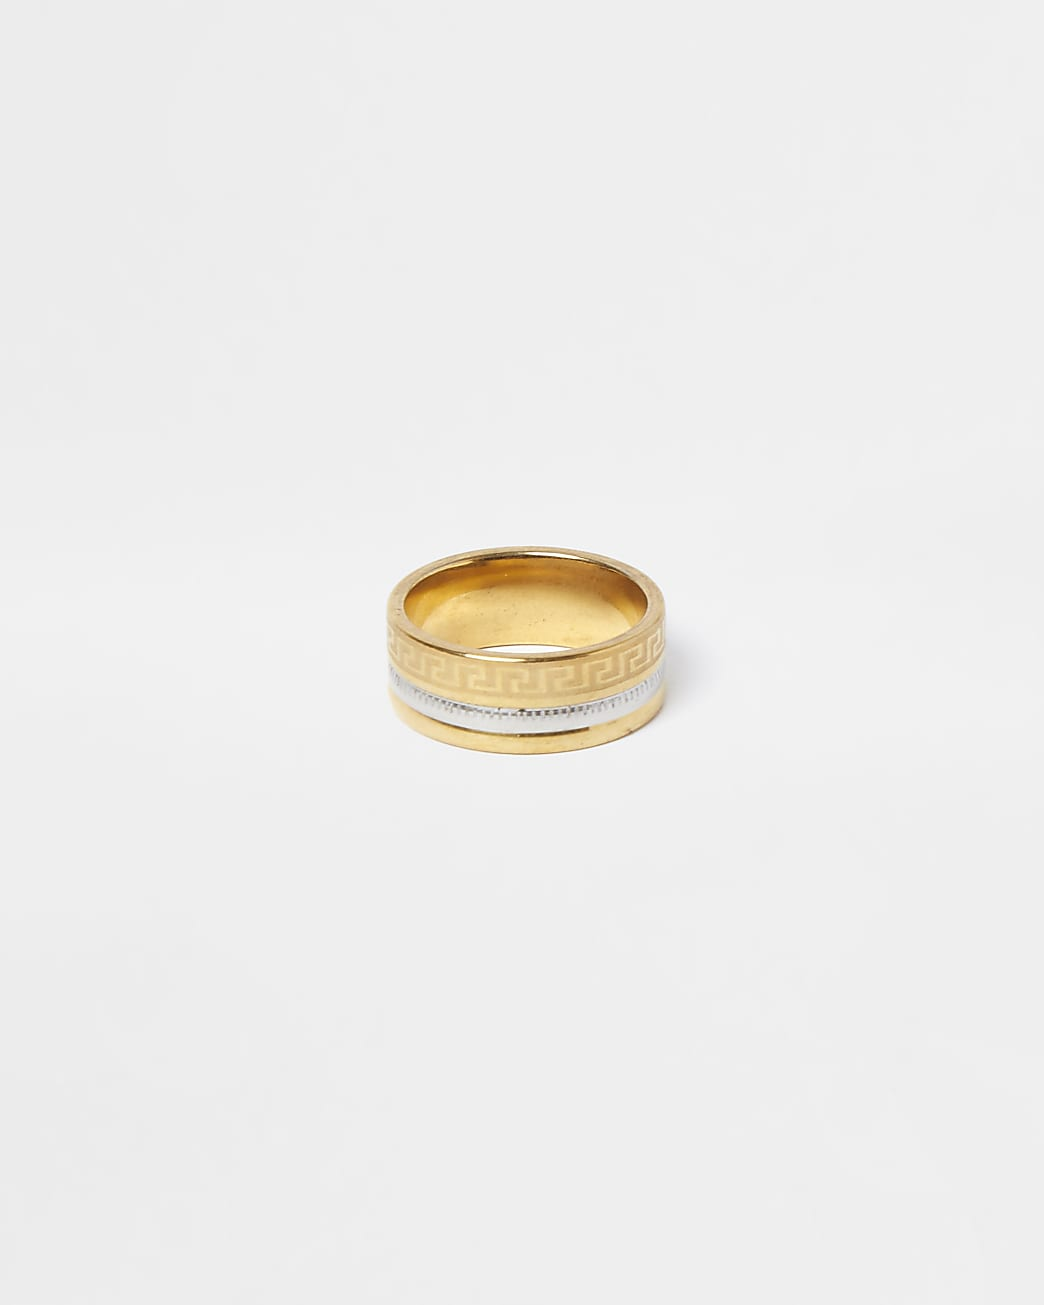 Multi stainless steel Roman band ring